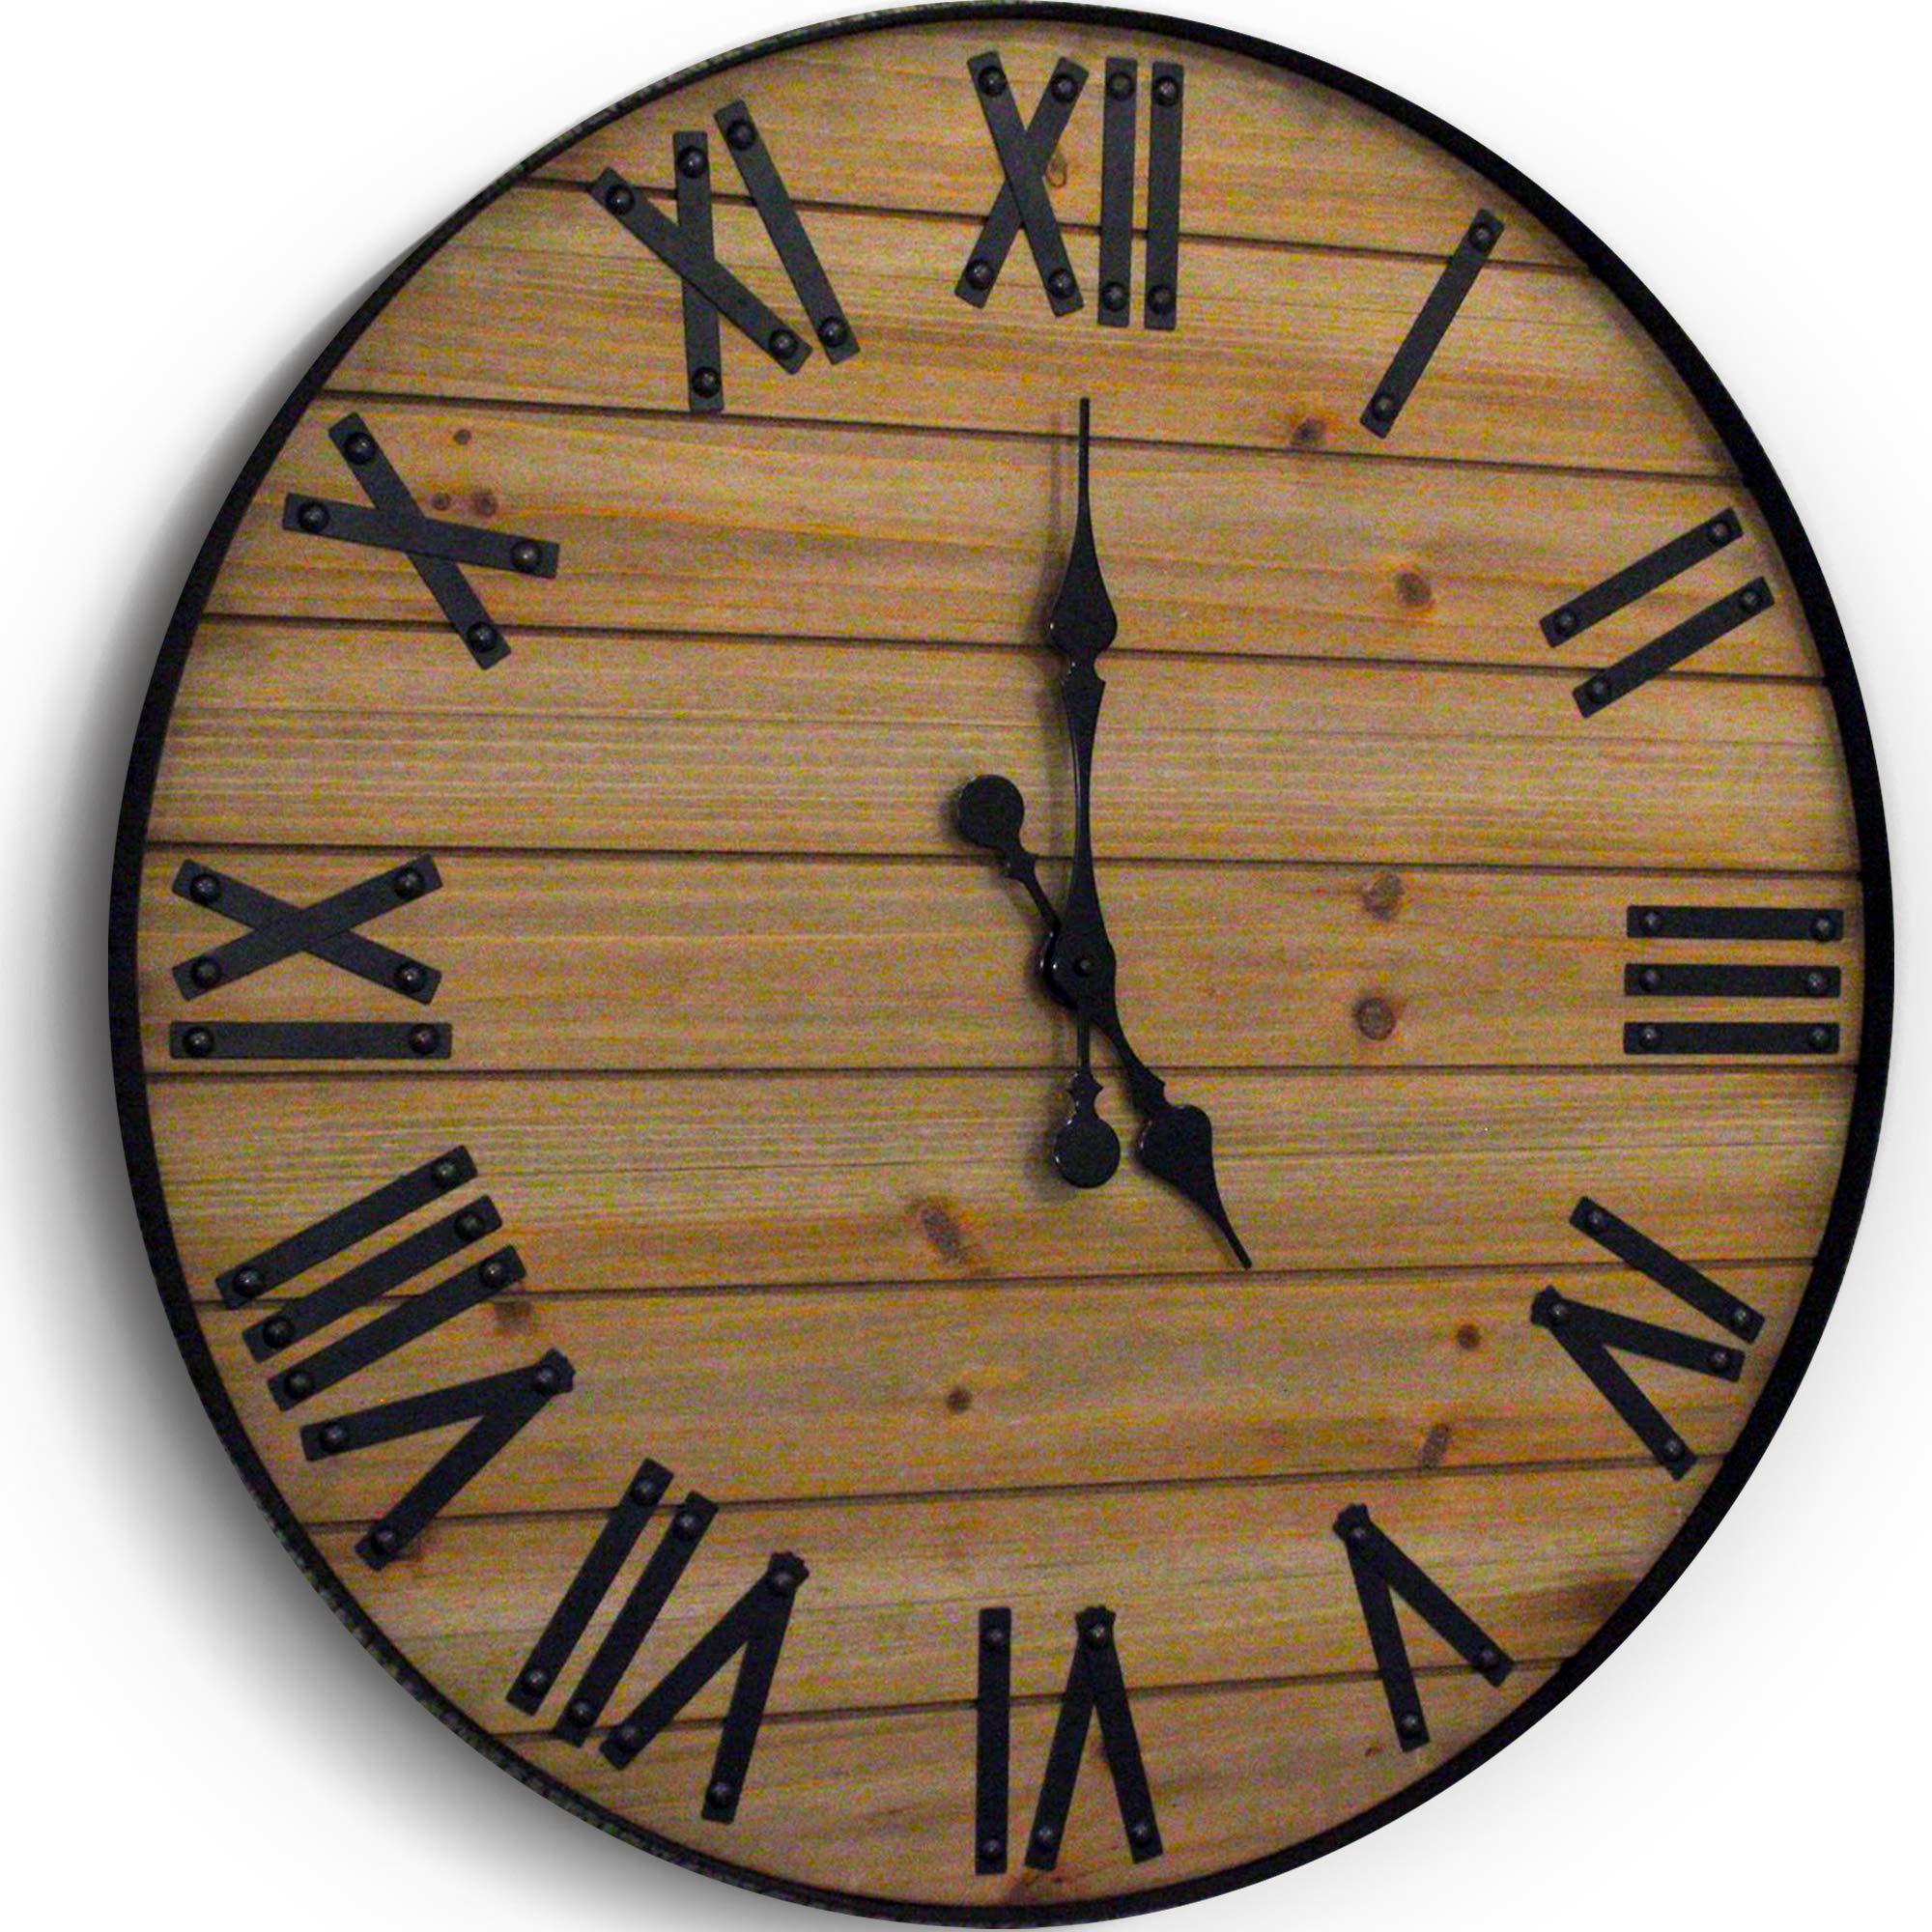 WallCharmers 24 inch Rustic Wall Clock | Handmade Large Clock | Real Wood Clock Beautiful Decorative Wall Clock Large |Oversized Wall Clock Large Wall Clock Wooden Clock Rustic Clock Large Wall Clocks by Wallcharmers